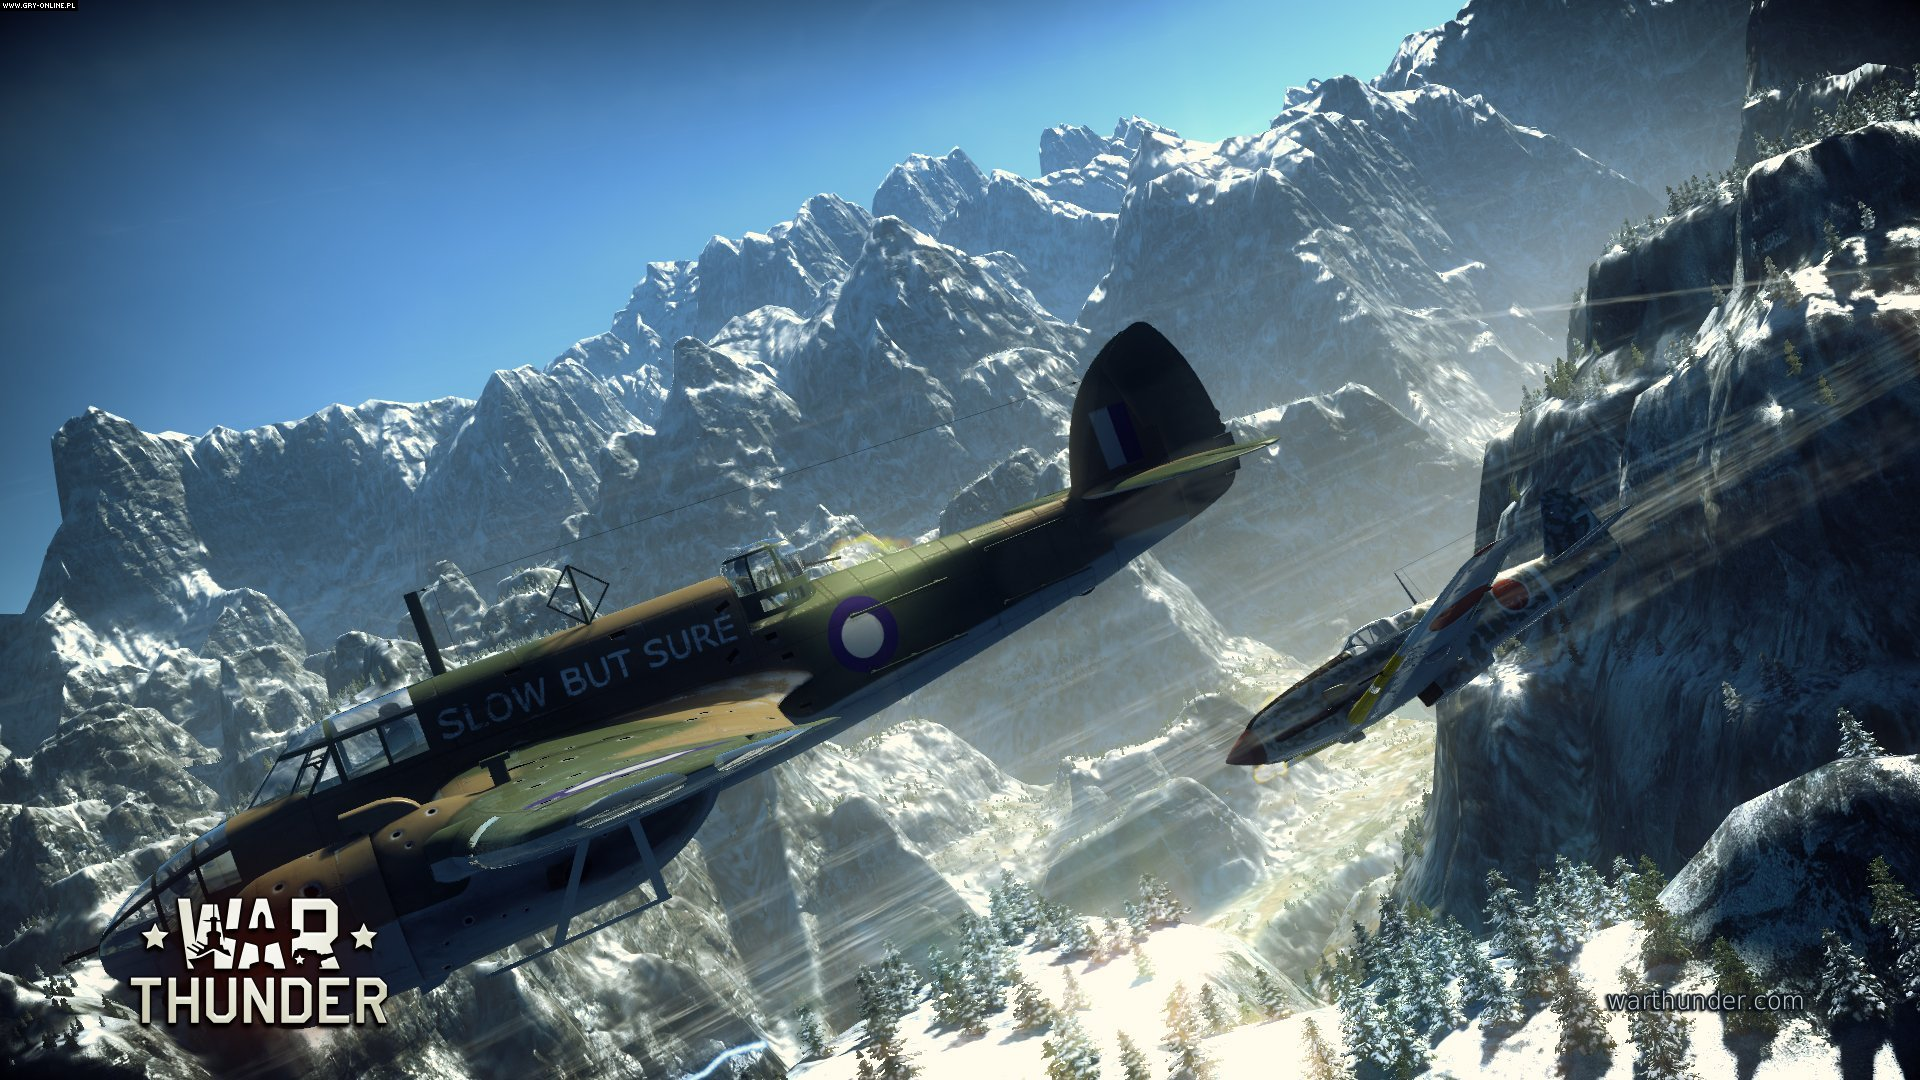 HD War Thunder Wallpapers - WallpaperSafari